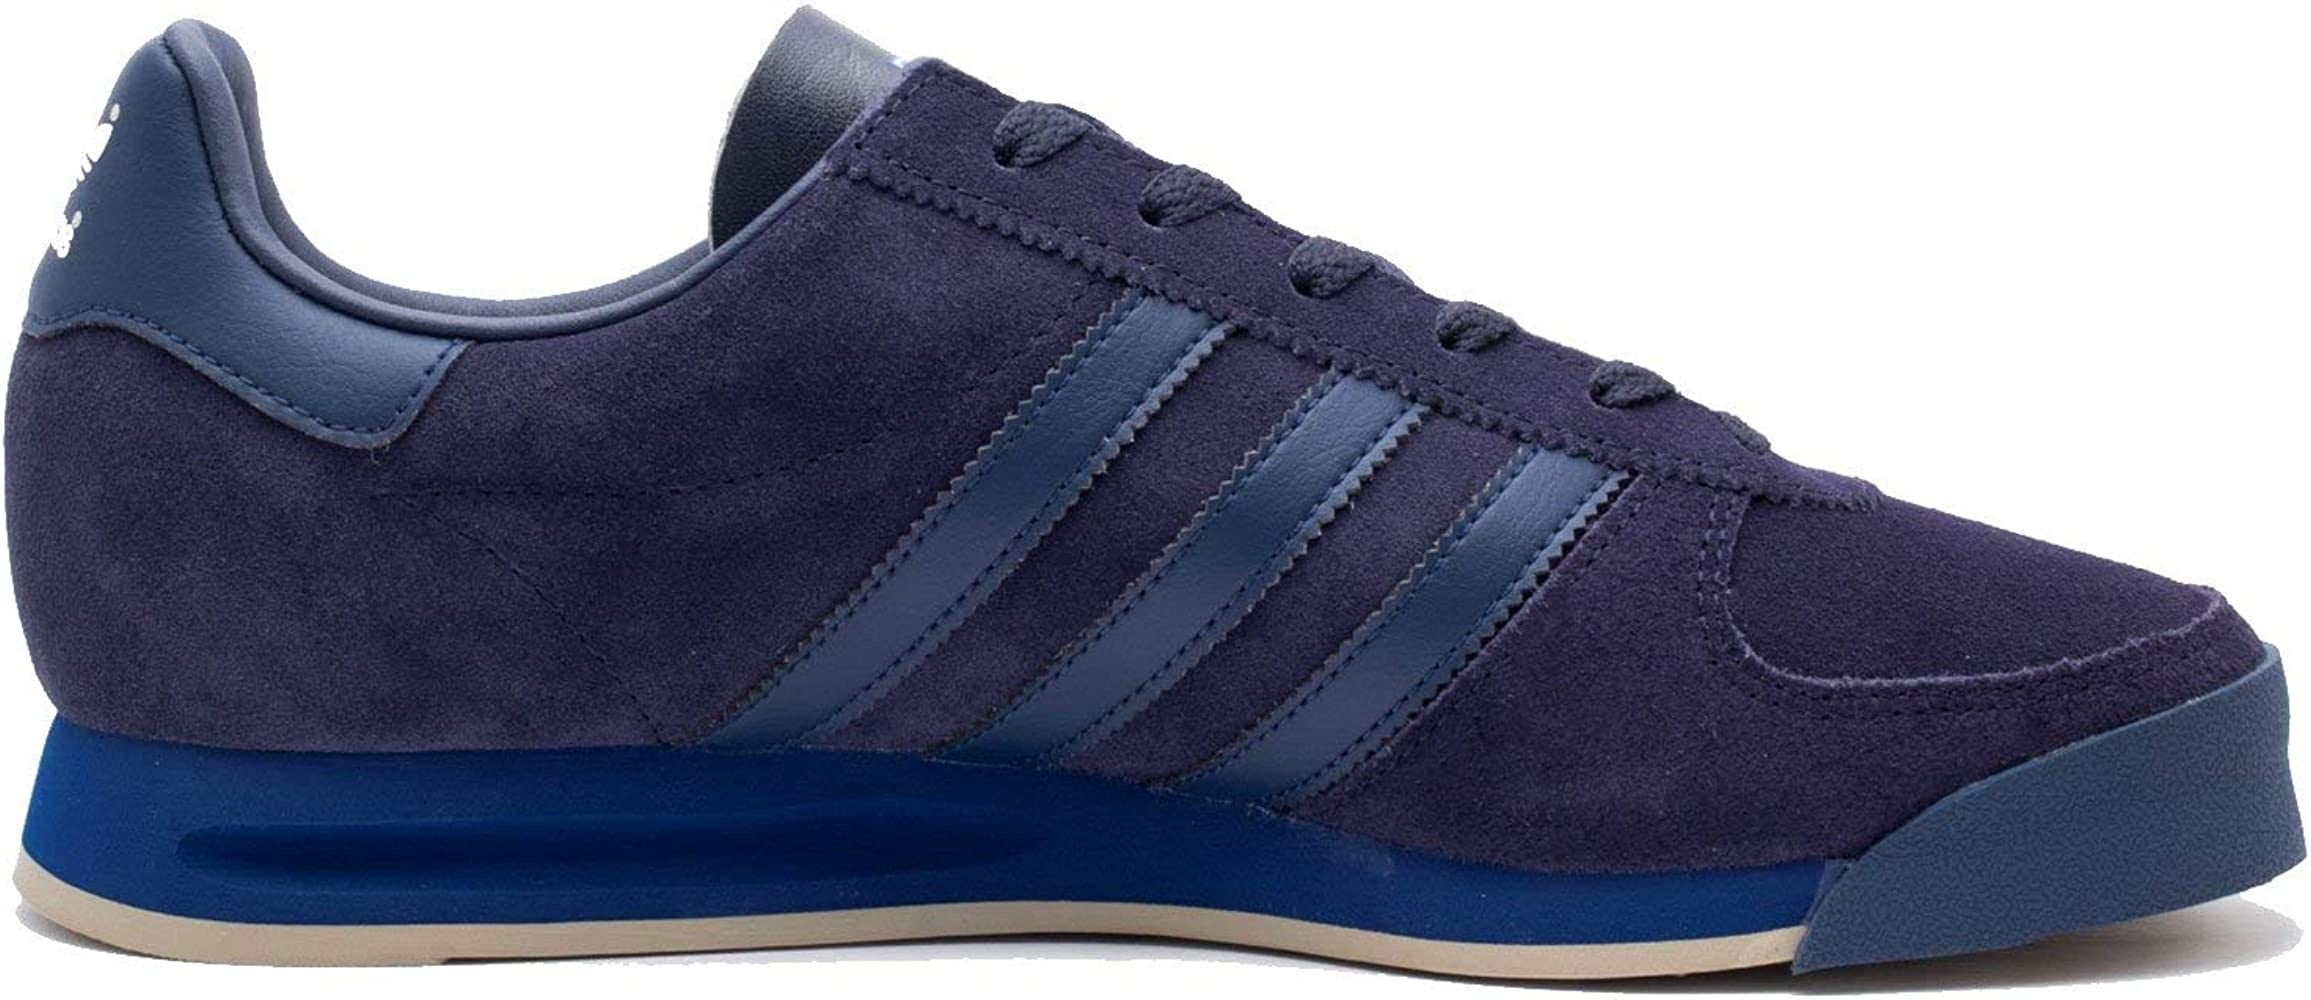 adidas Men's AS 520 SPZL Blue F35711